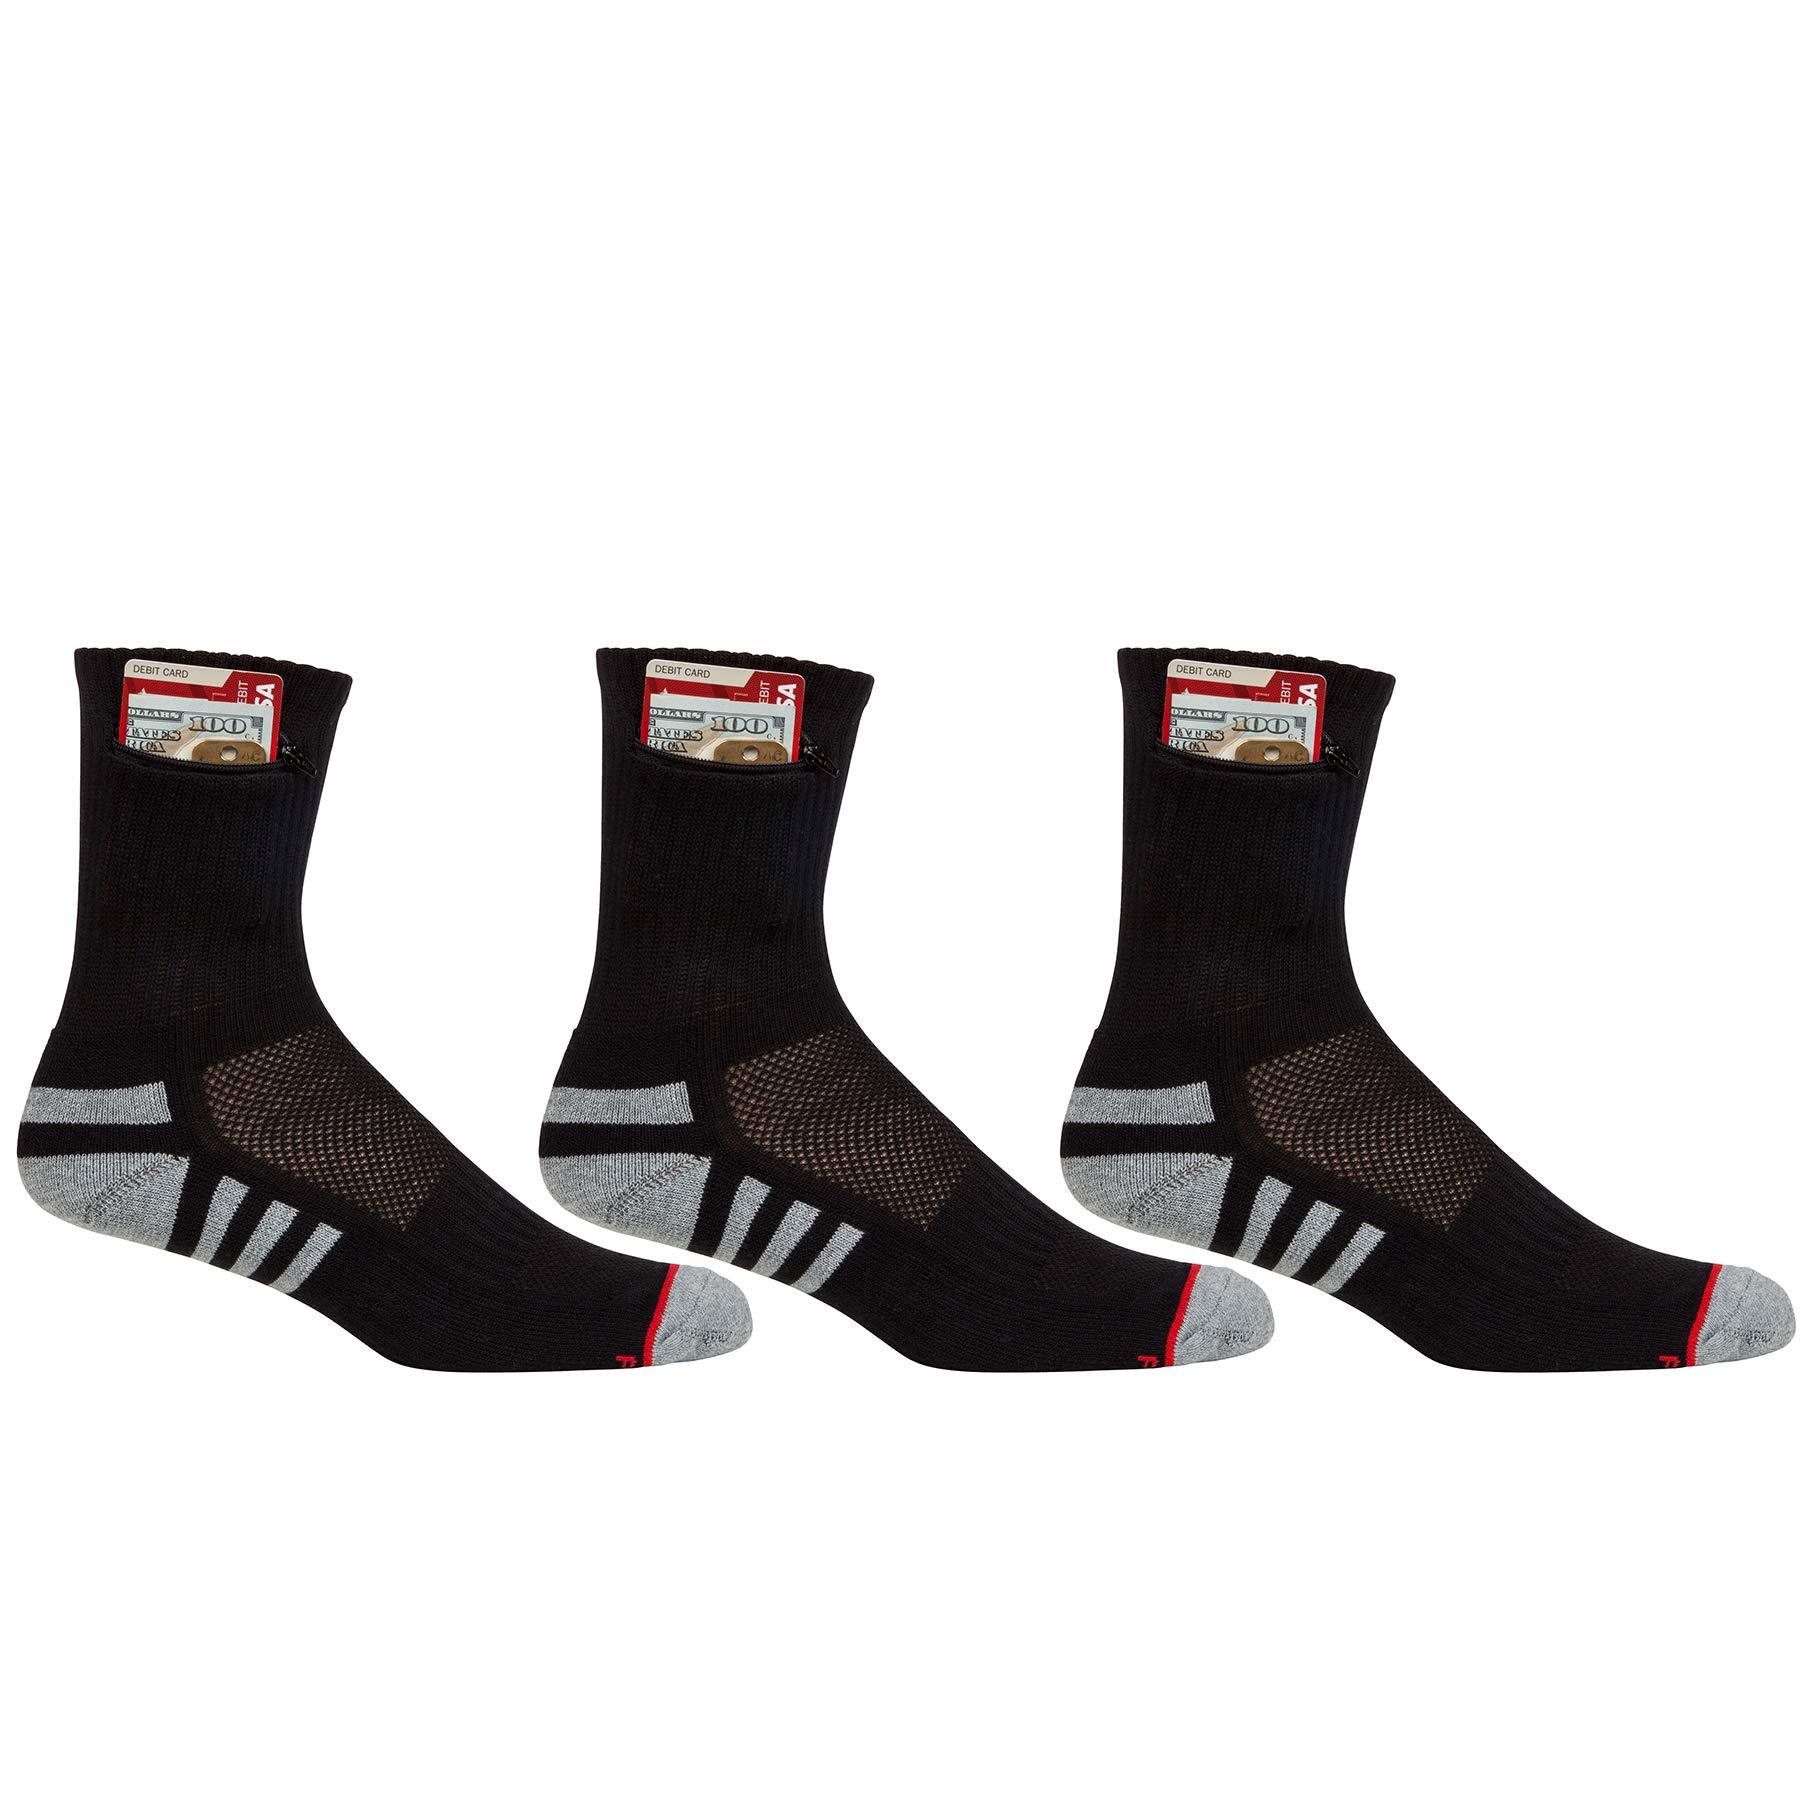 Pocket Socks Men's 3-Pack Athletic Travel Ankle Socks with Hidden Zip Security Pocket for ID, Key or Cash Money, One Size Fits Most, Black, 3 Pair by Pocket Socks